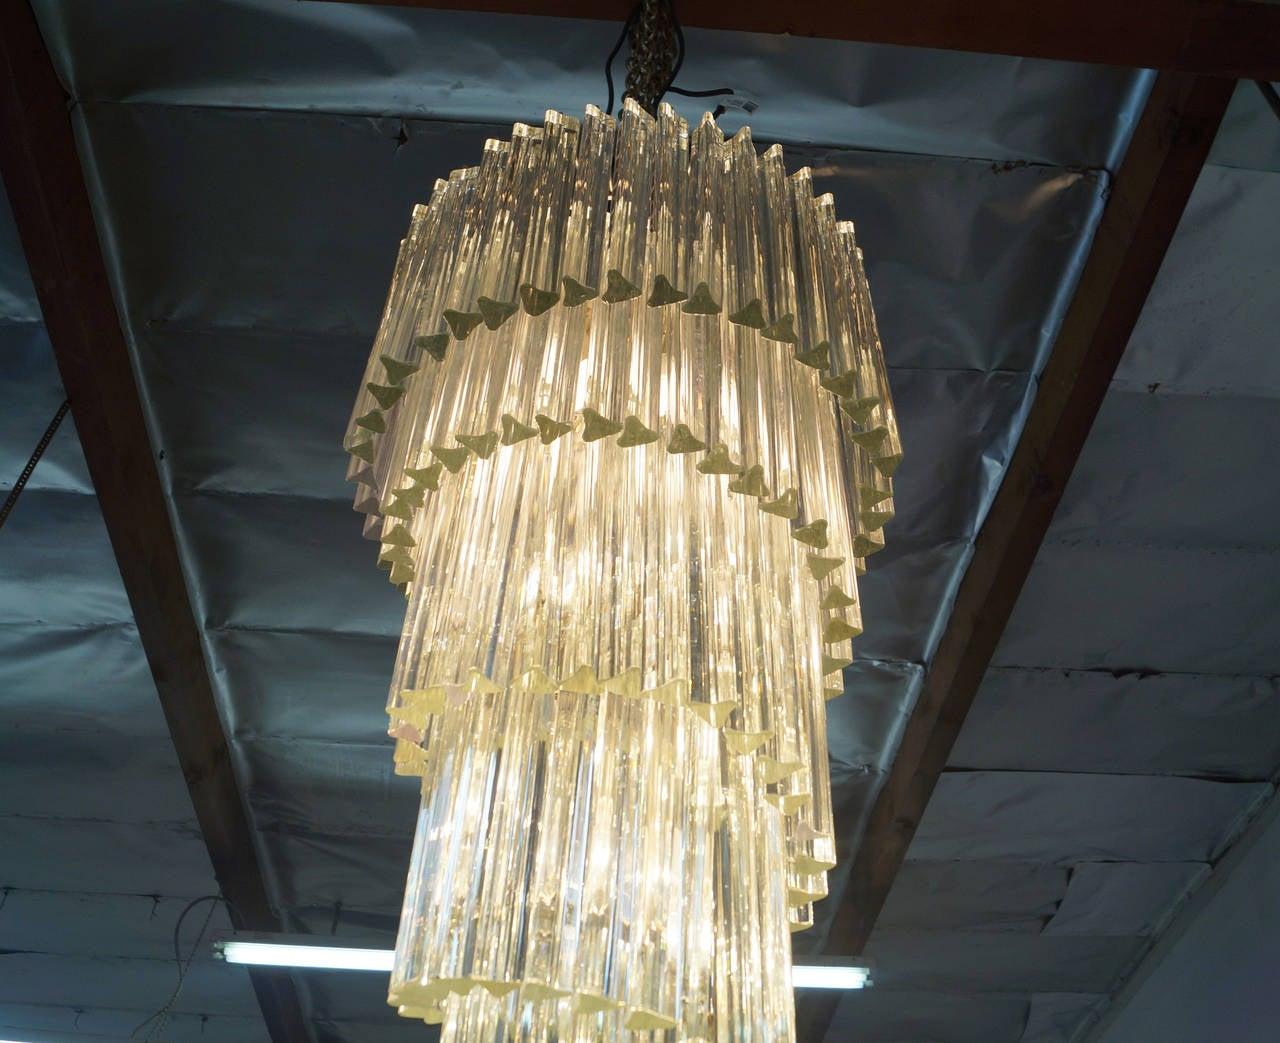 Spiral murano glass chandelier by venini for sale at 1stdibs - Kristallleuchter modern ...